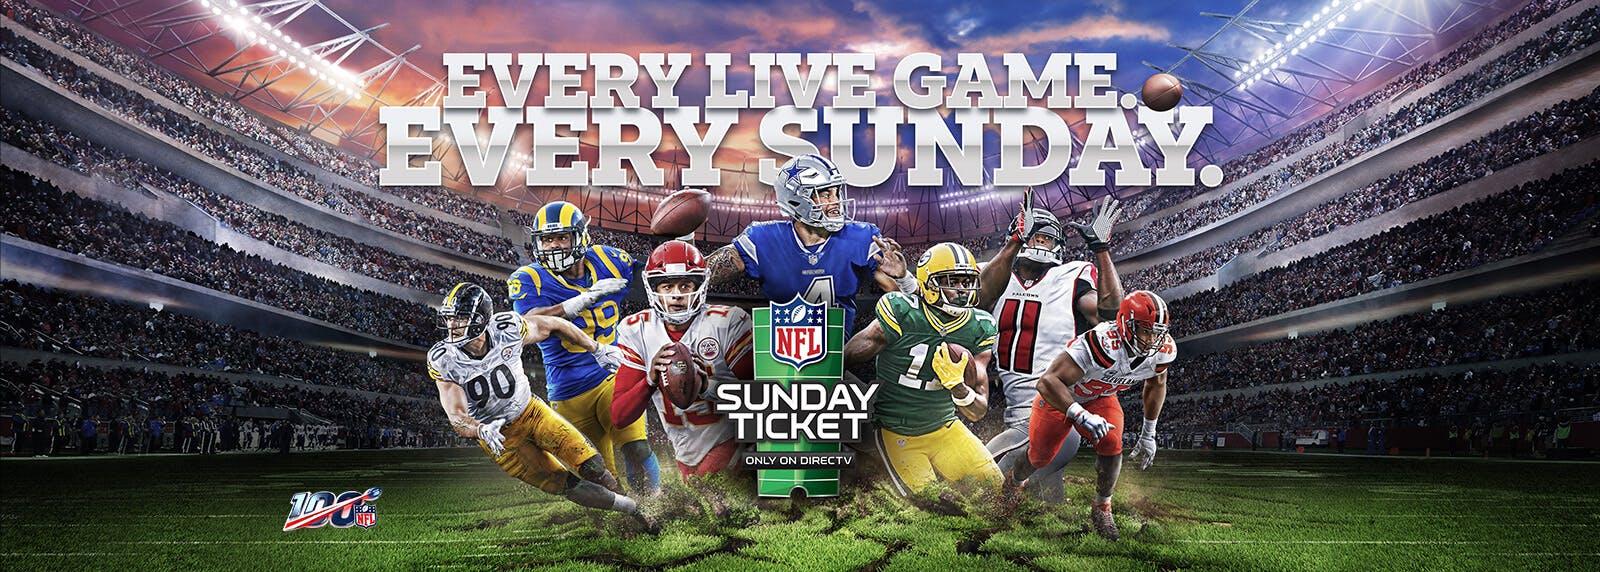 watch vikings vs lions live stream nfl sunday ticket